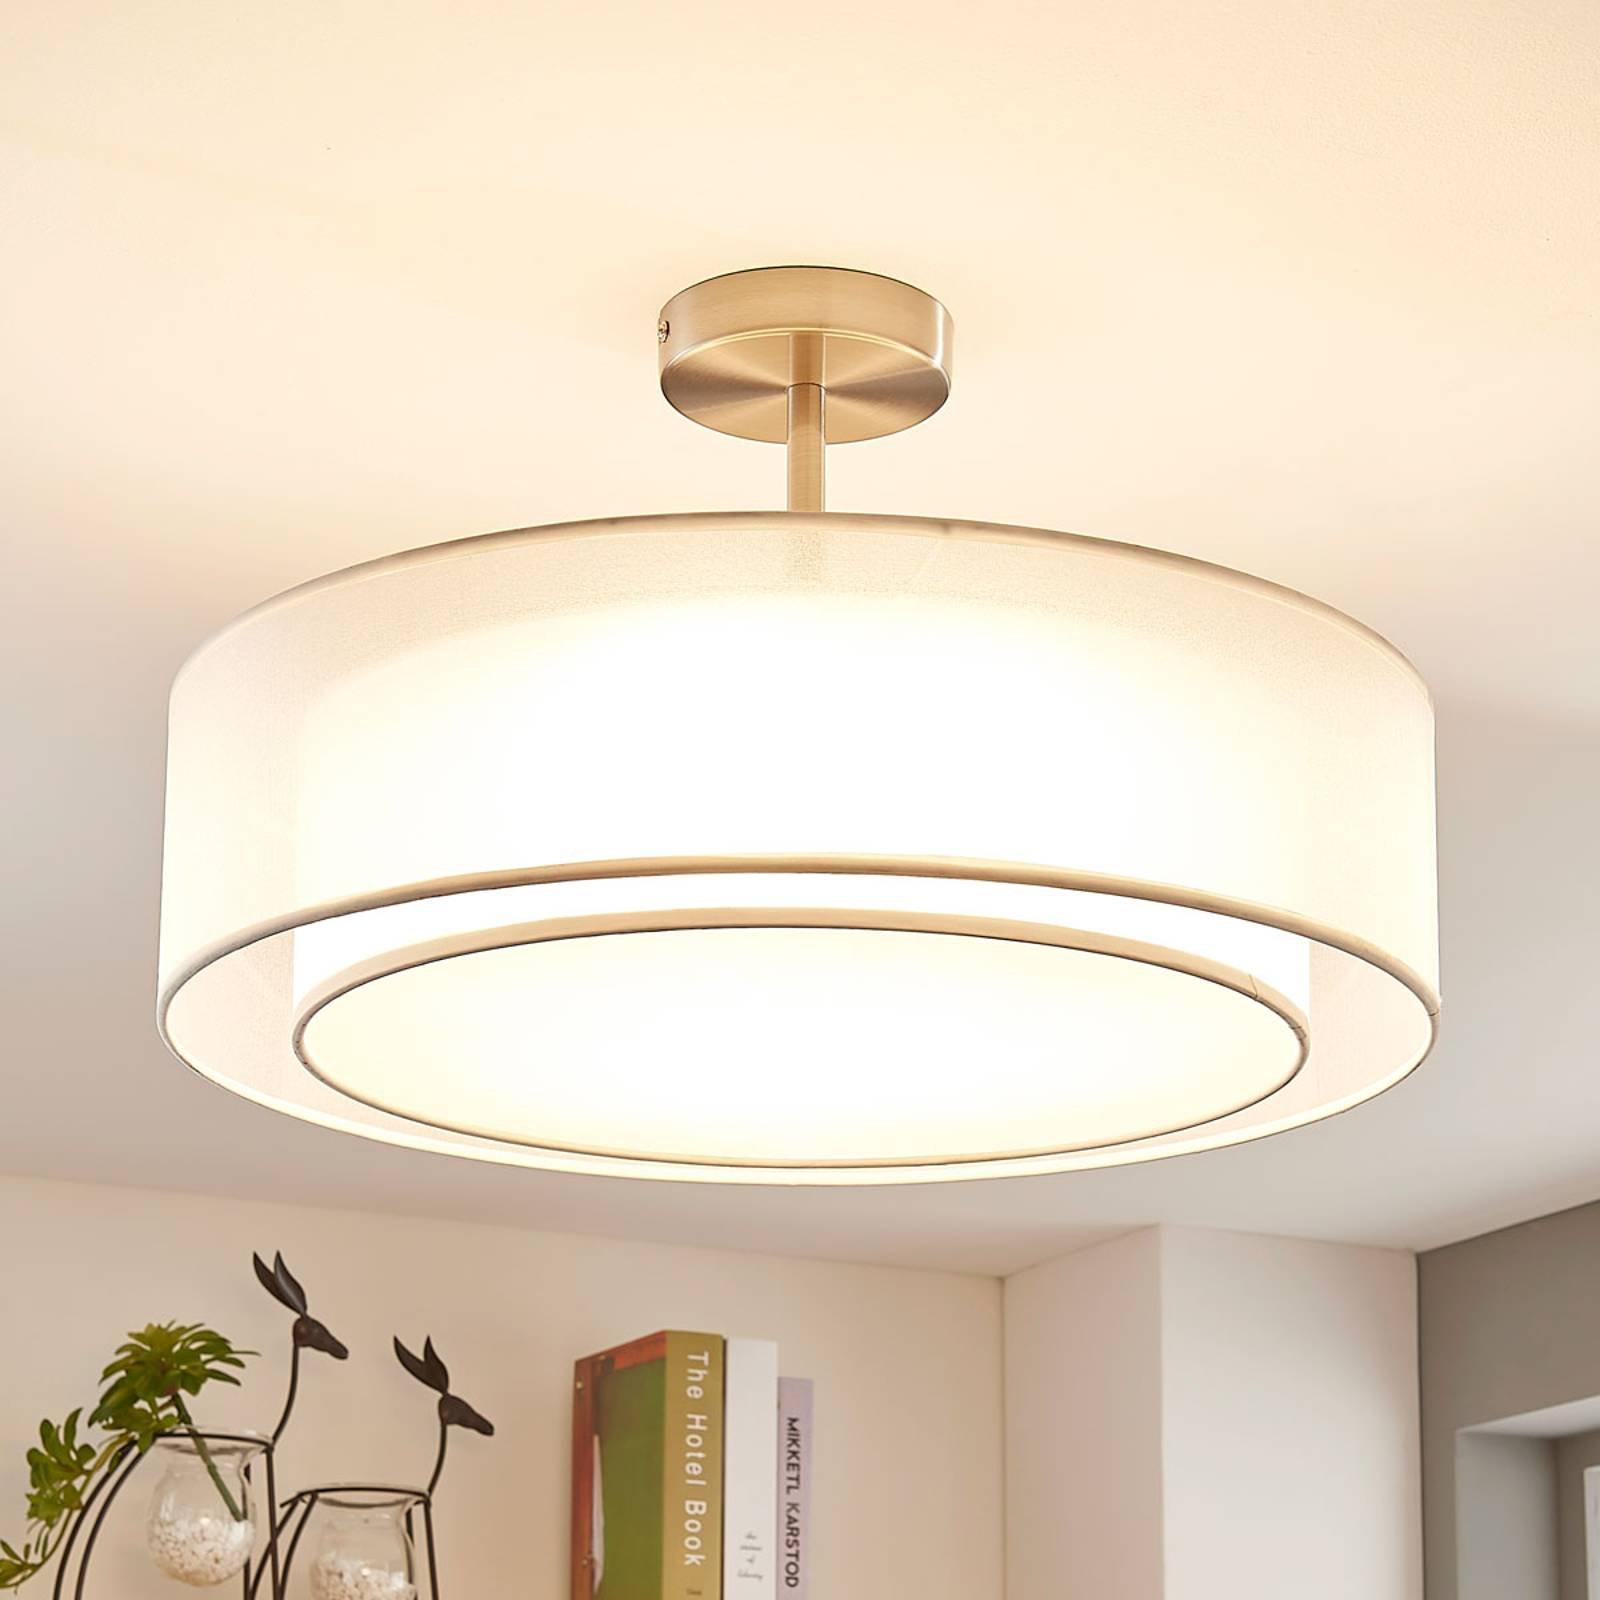 LED-taklampe Pikka, 3-trinns dimbar, hvit